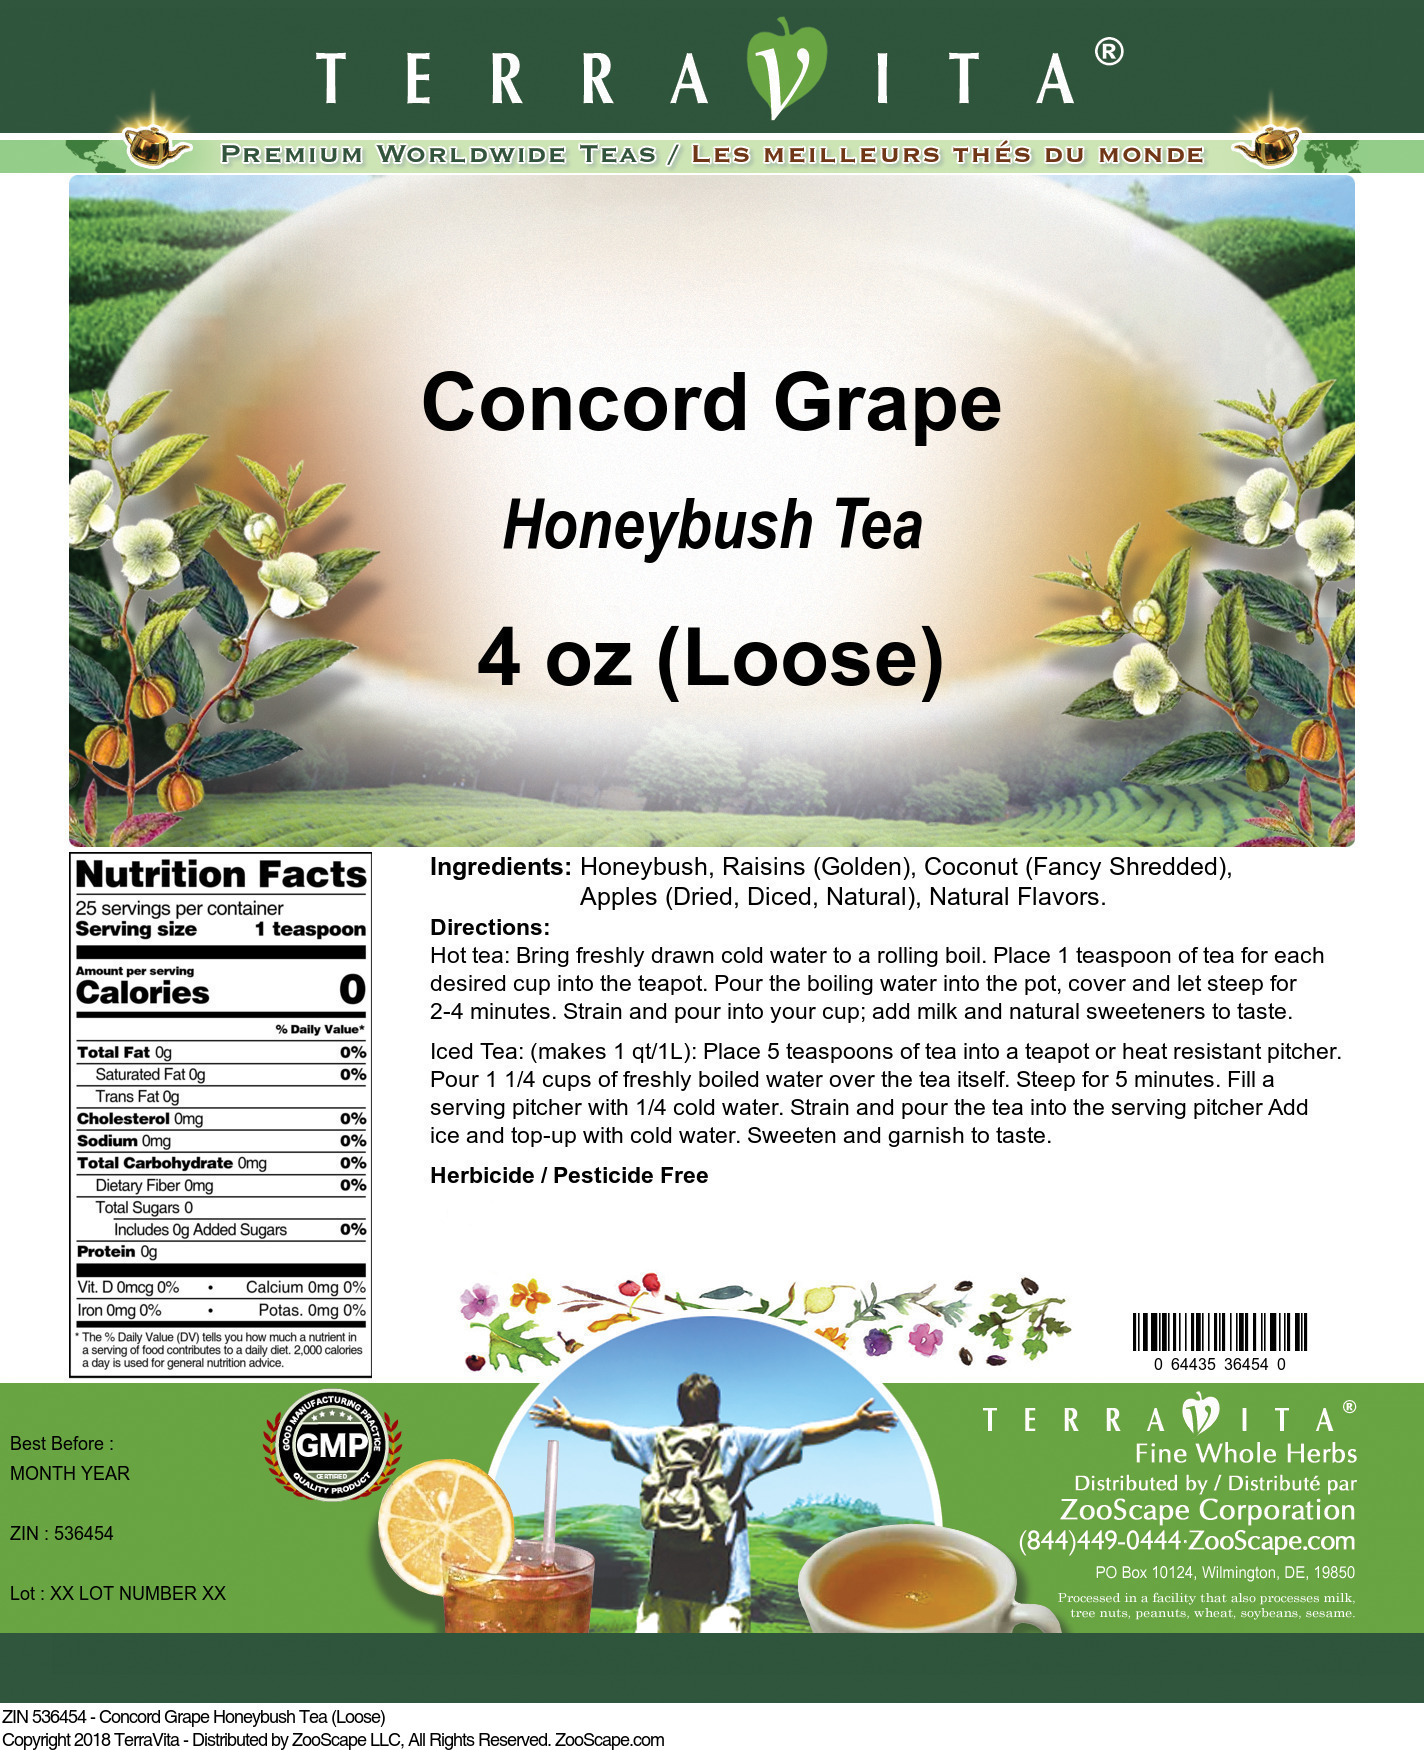 Concord Grape Honeybush Tea (Loose)